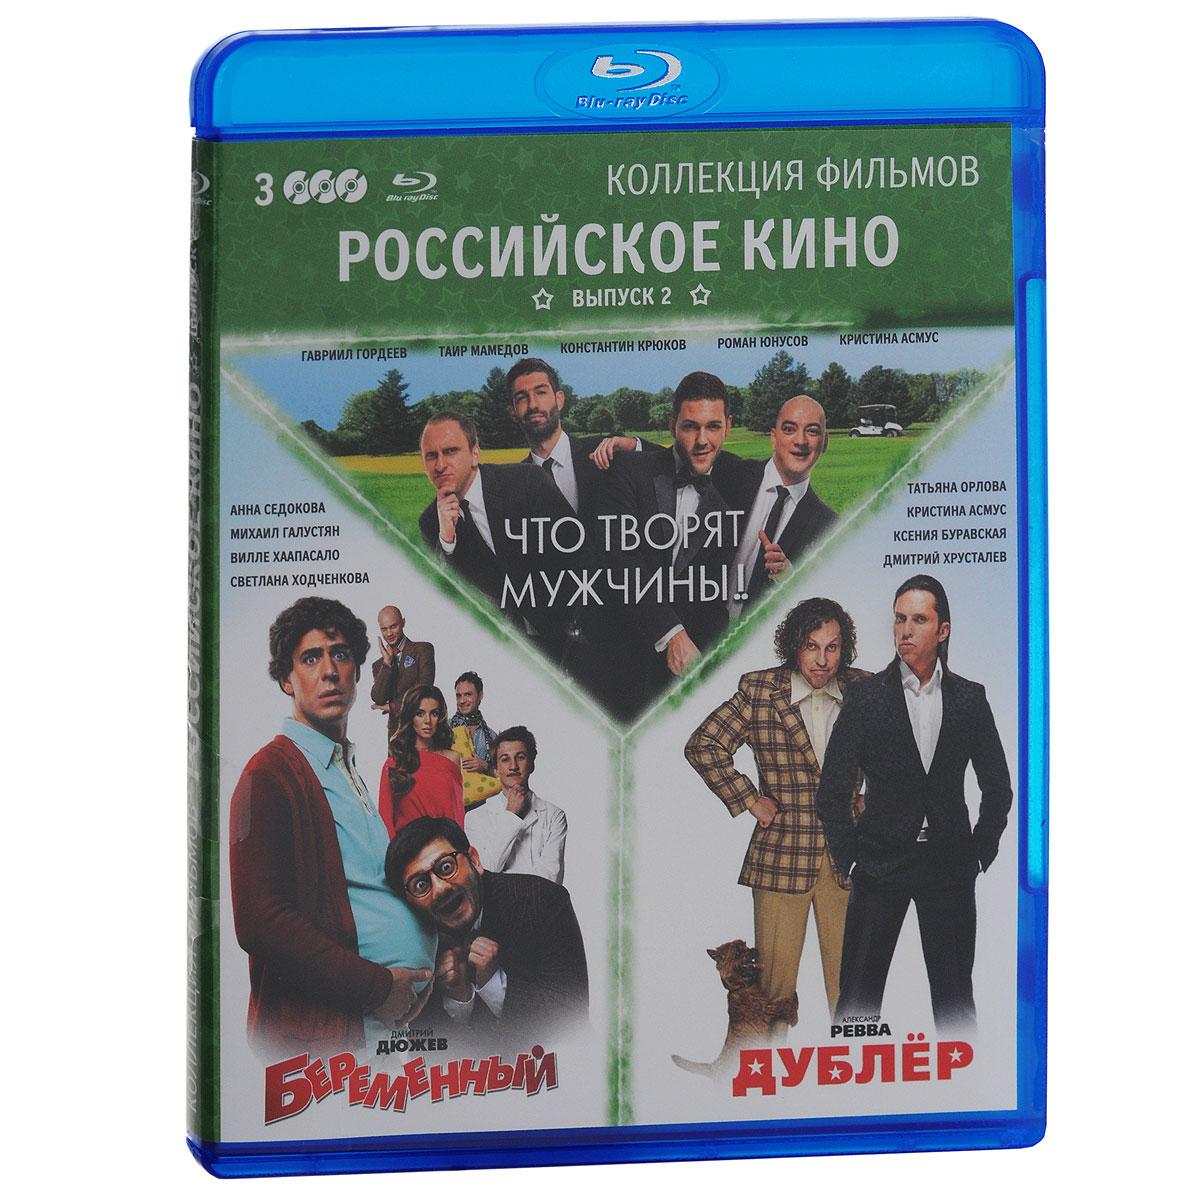 Что творят мужчины! / Беременный / Дублер (3 Blu-ray) gregorian video anthology volume 1 blu ray